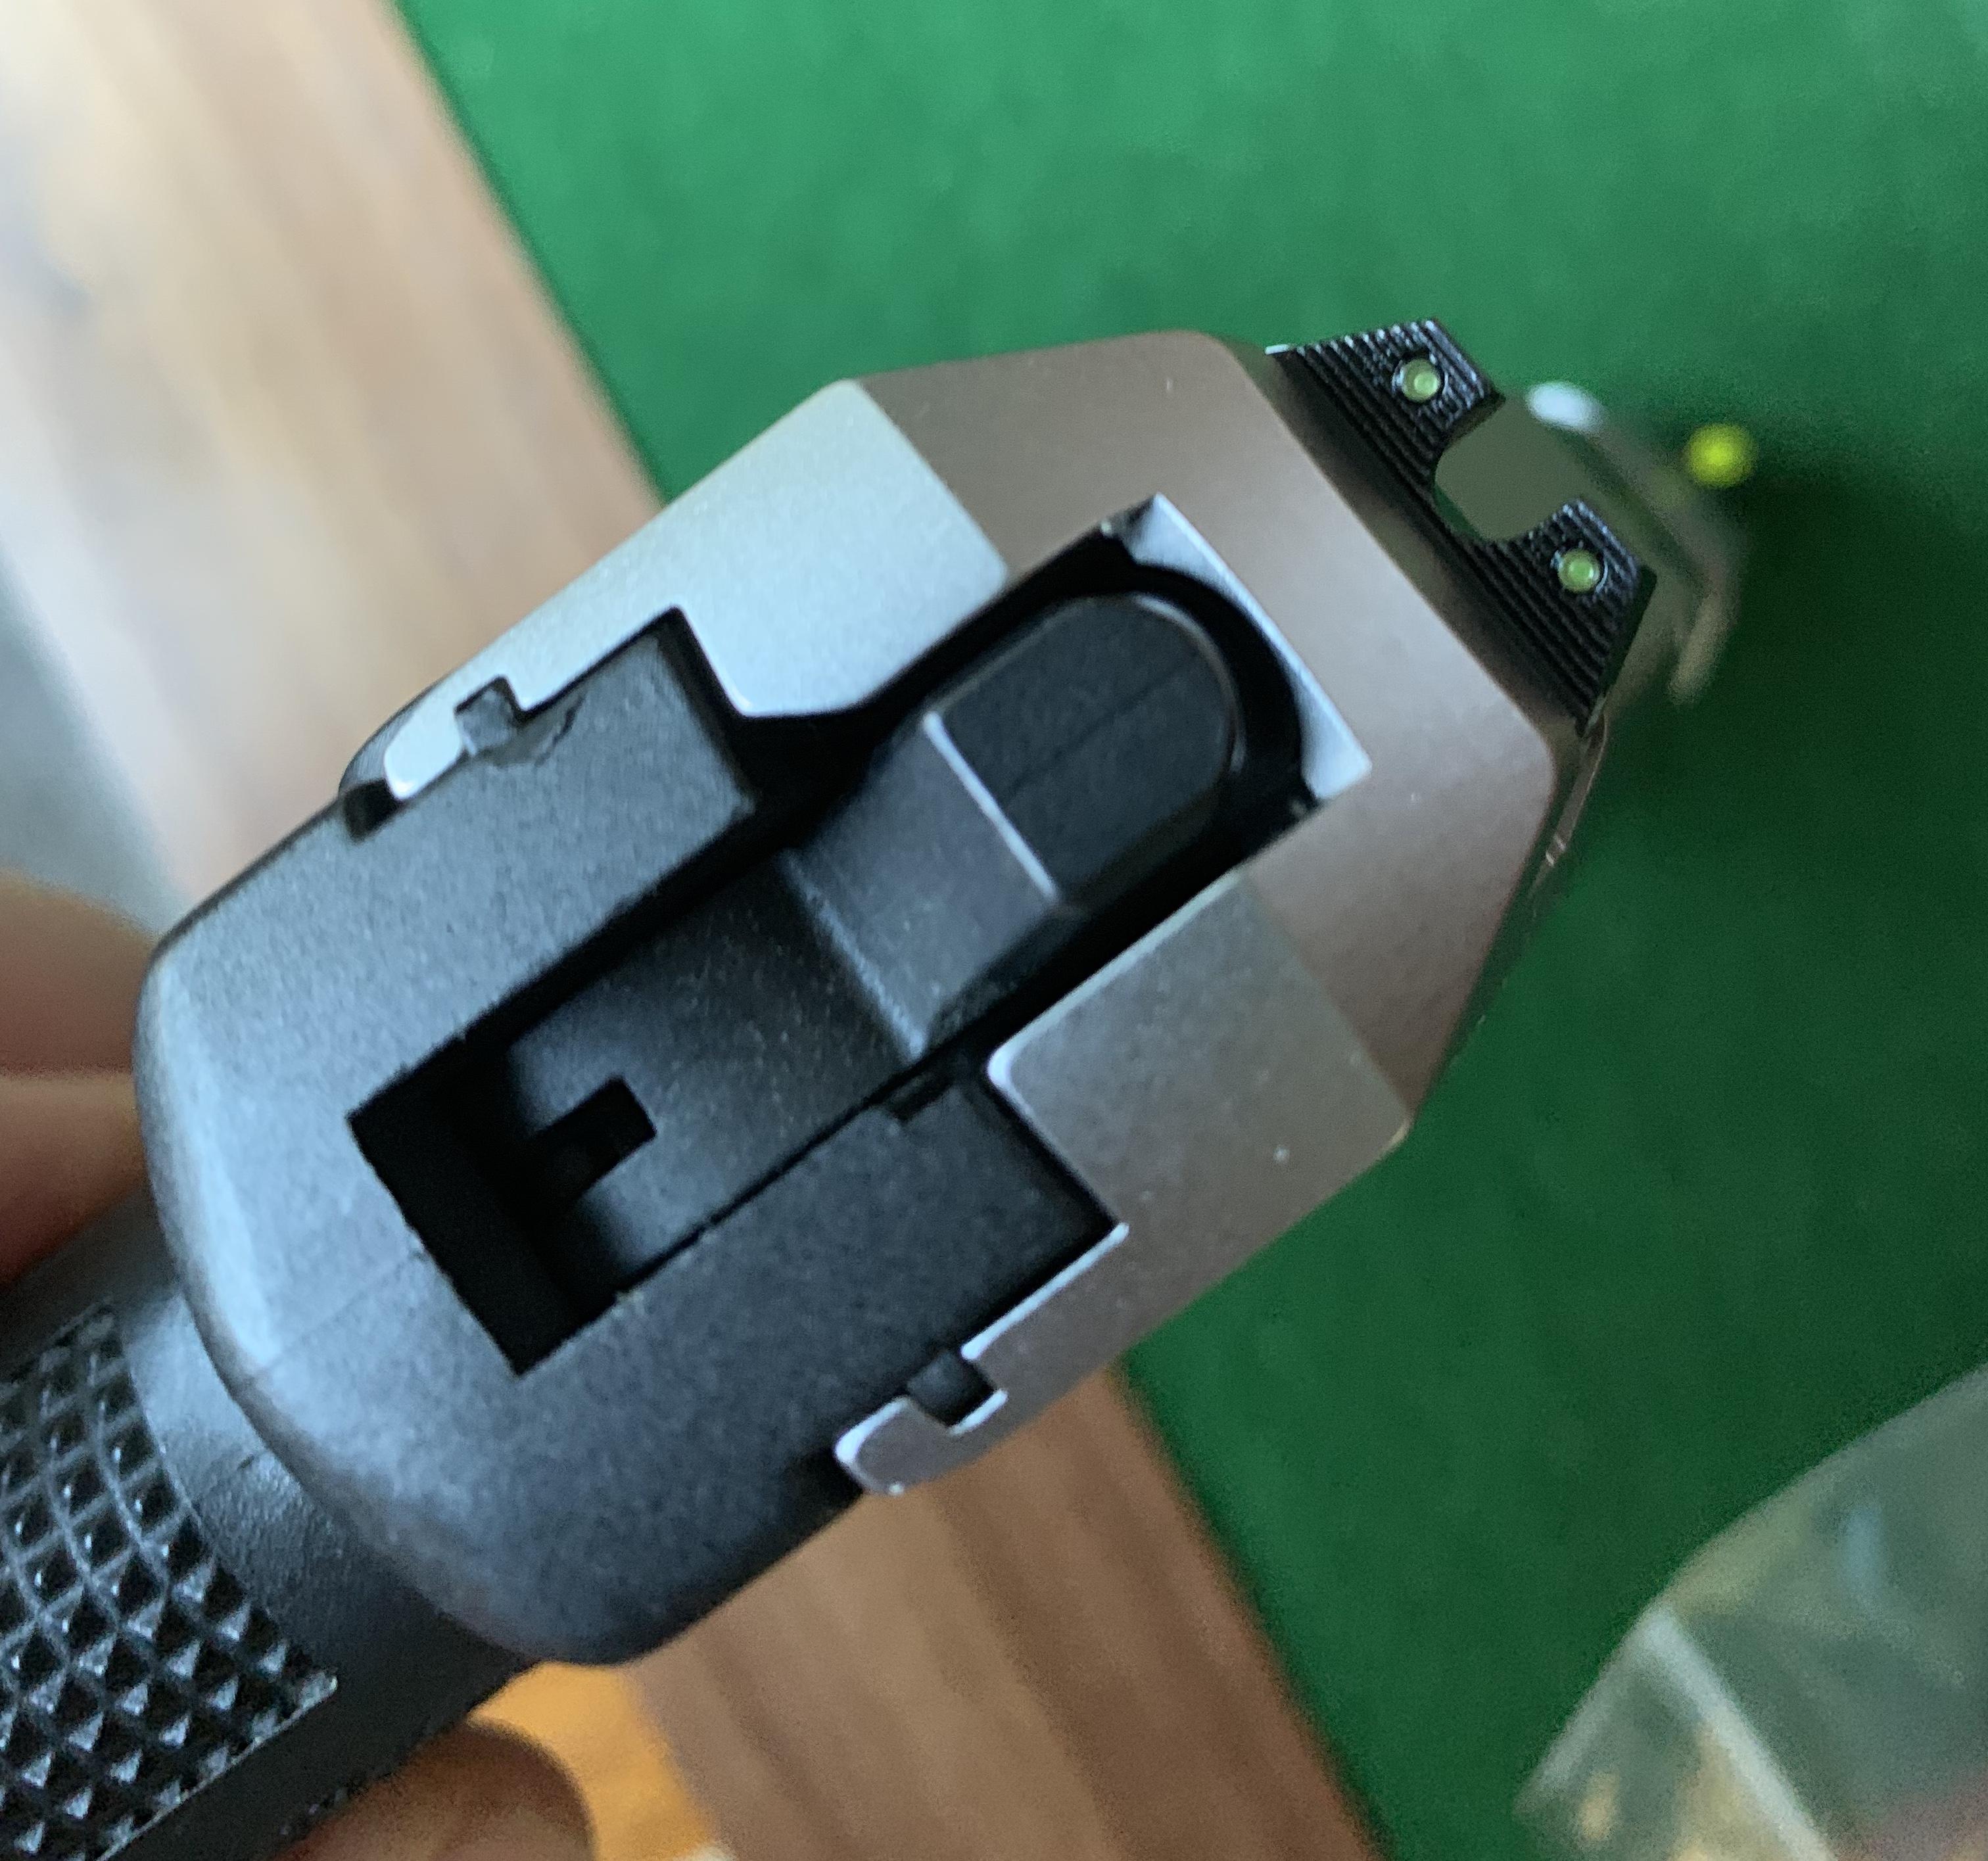 WTS: HK USPC 9mm SS Slide + SOLD - SOLD-usp-9mm-ss-parts-7-.jpeg